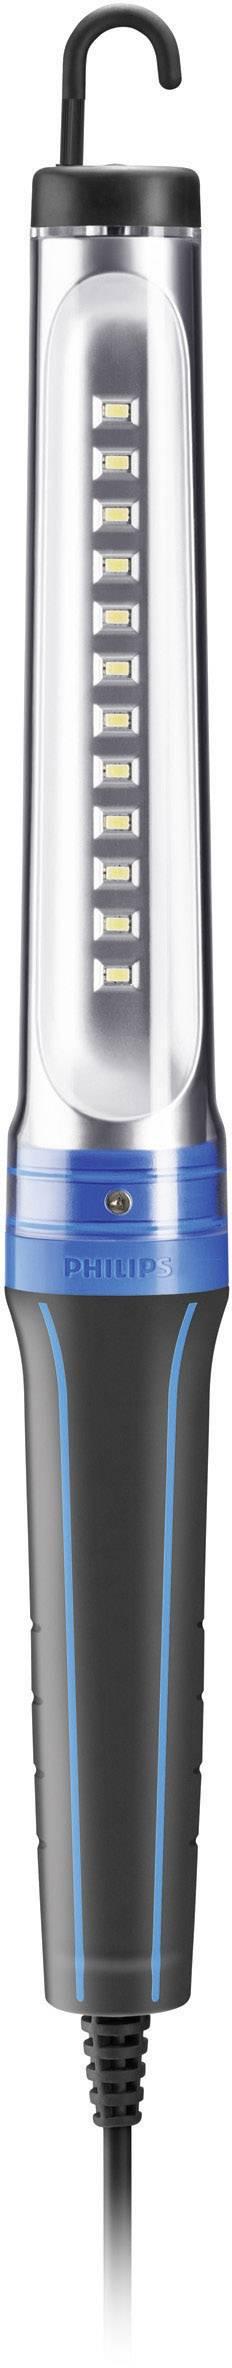 Philips LED-Arbeitsleuchte LPL16X1 CBL20